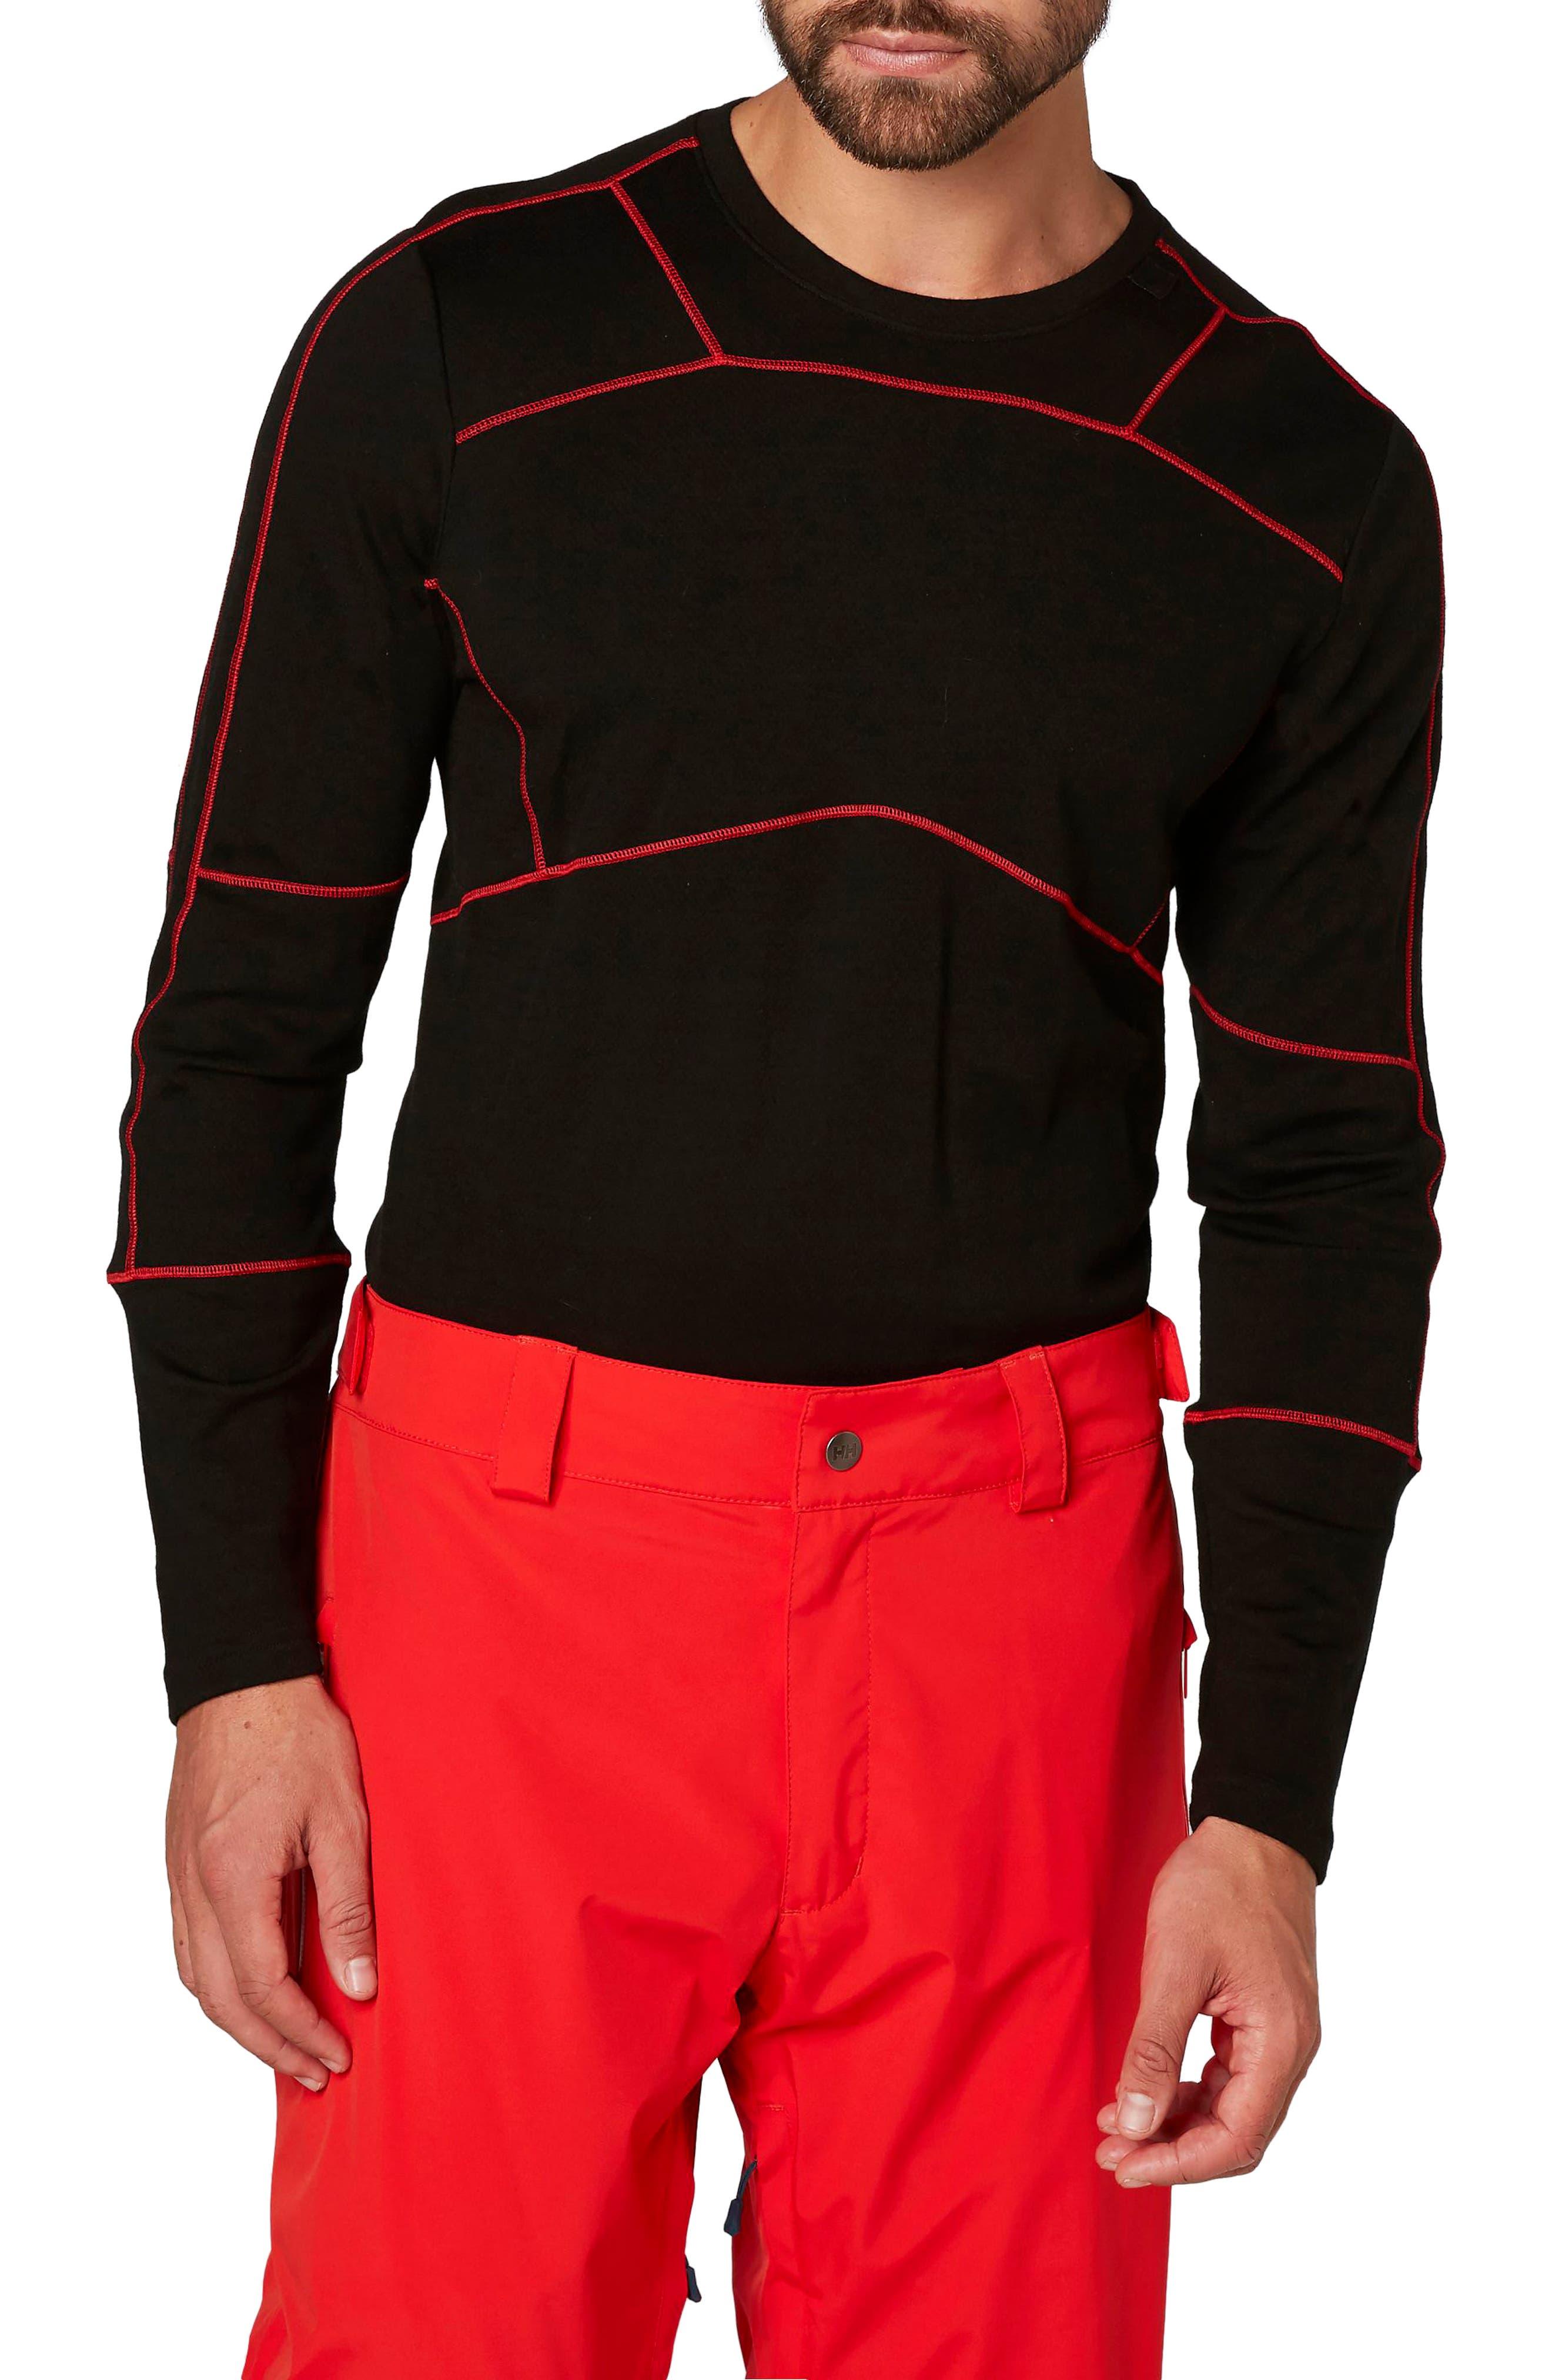 HH<sup>®</sup> Lifa Merino Max Crewneck Pullover,                             Main thumbnail 1, color,                             Black / Flag Red